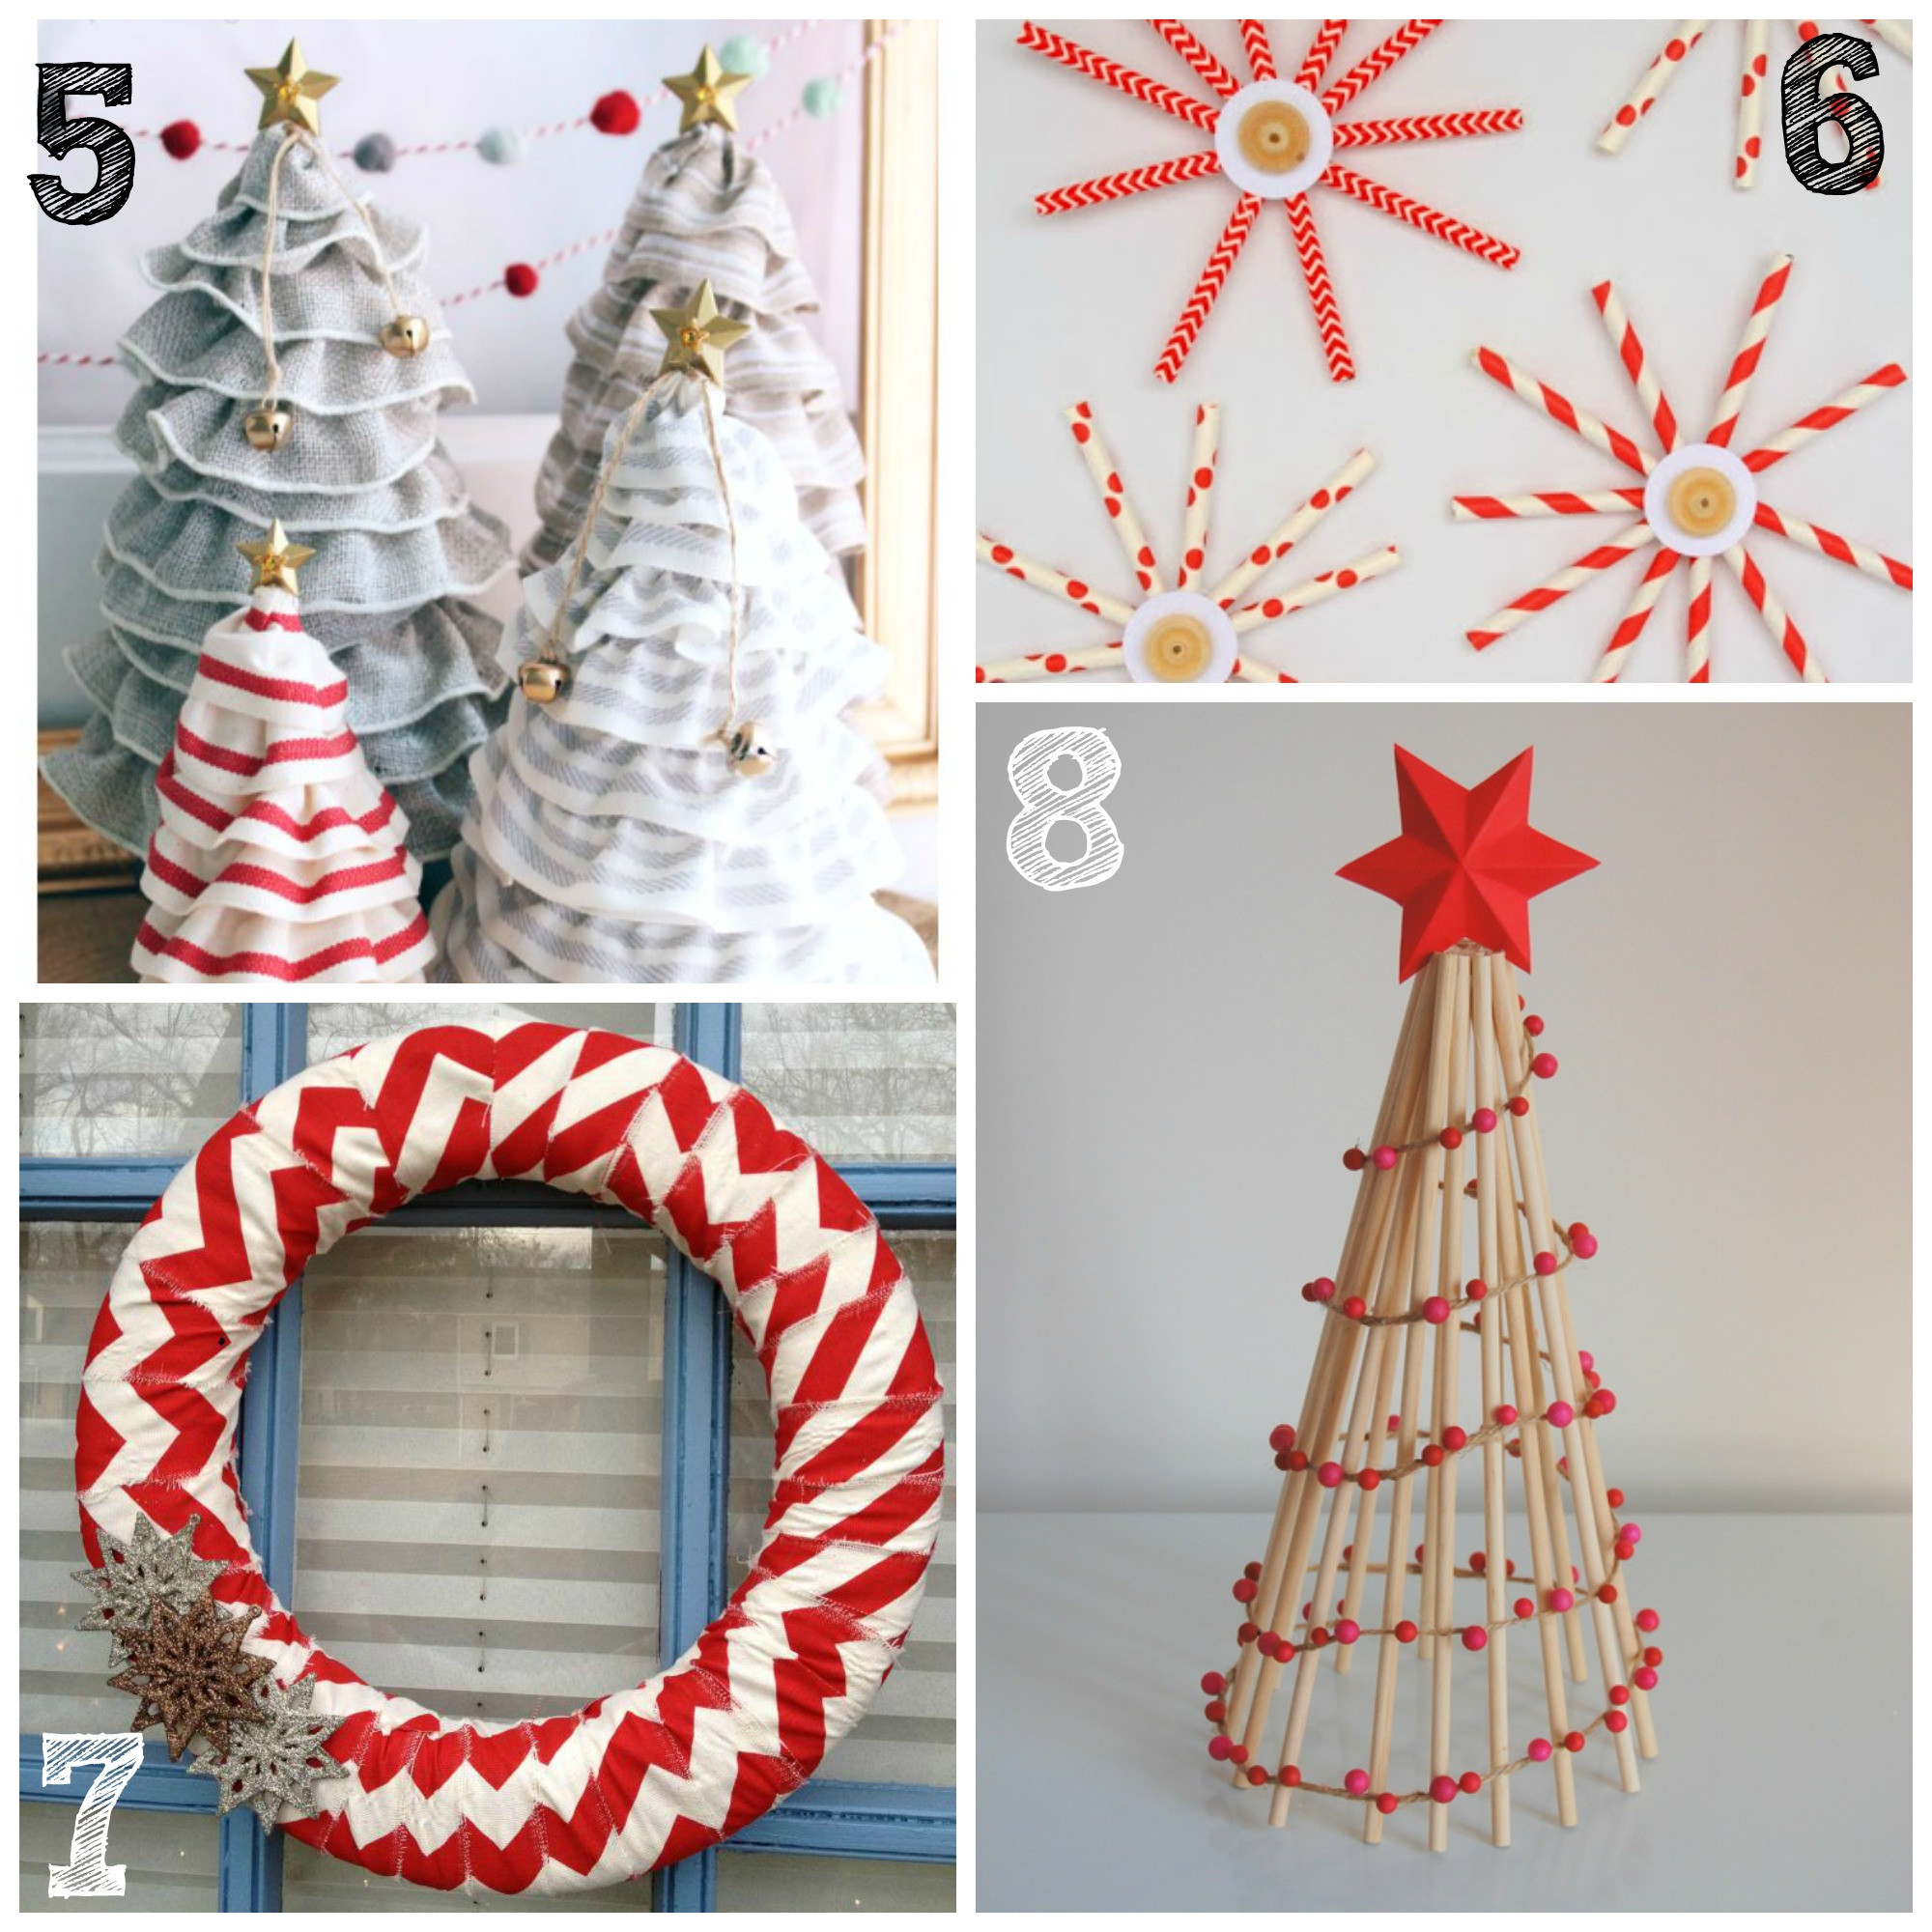 DIY Christmas Decorations  CANT TAKE UR EYES OF THE BEAUTIFUL HANDMADE CHRISTMAS